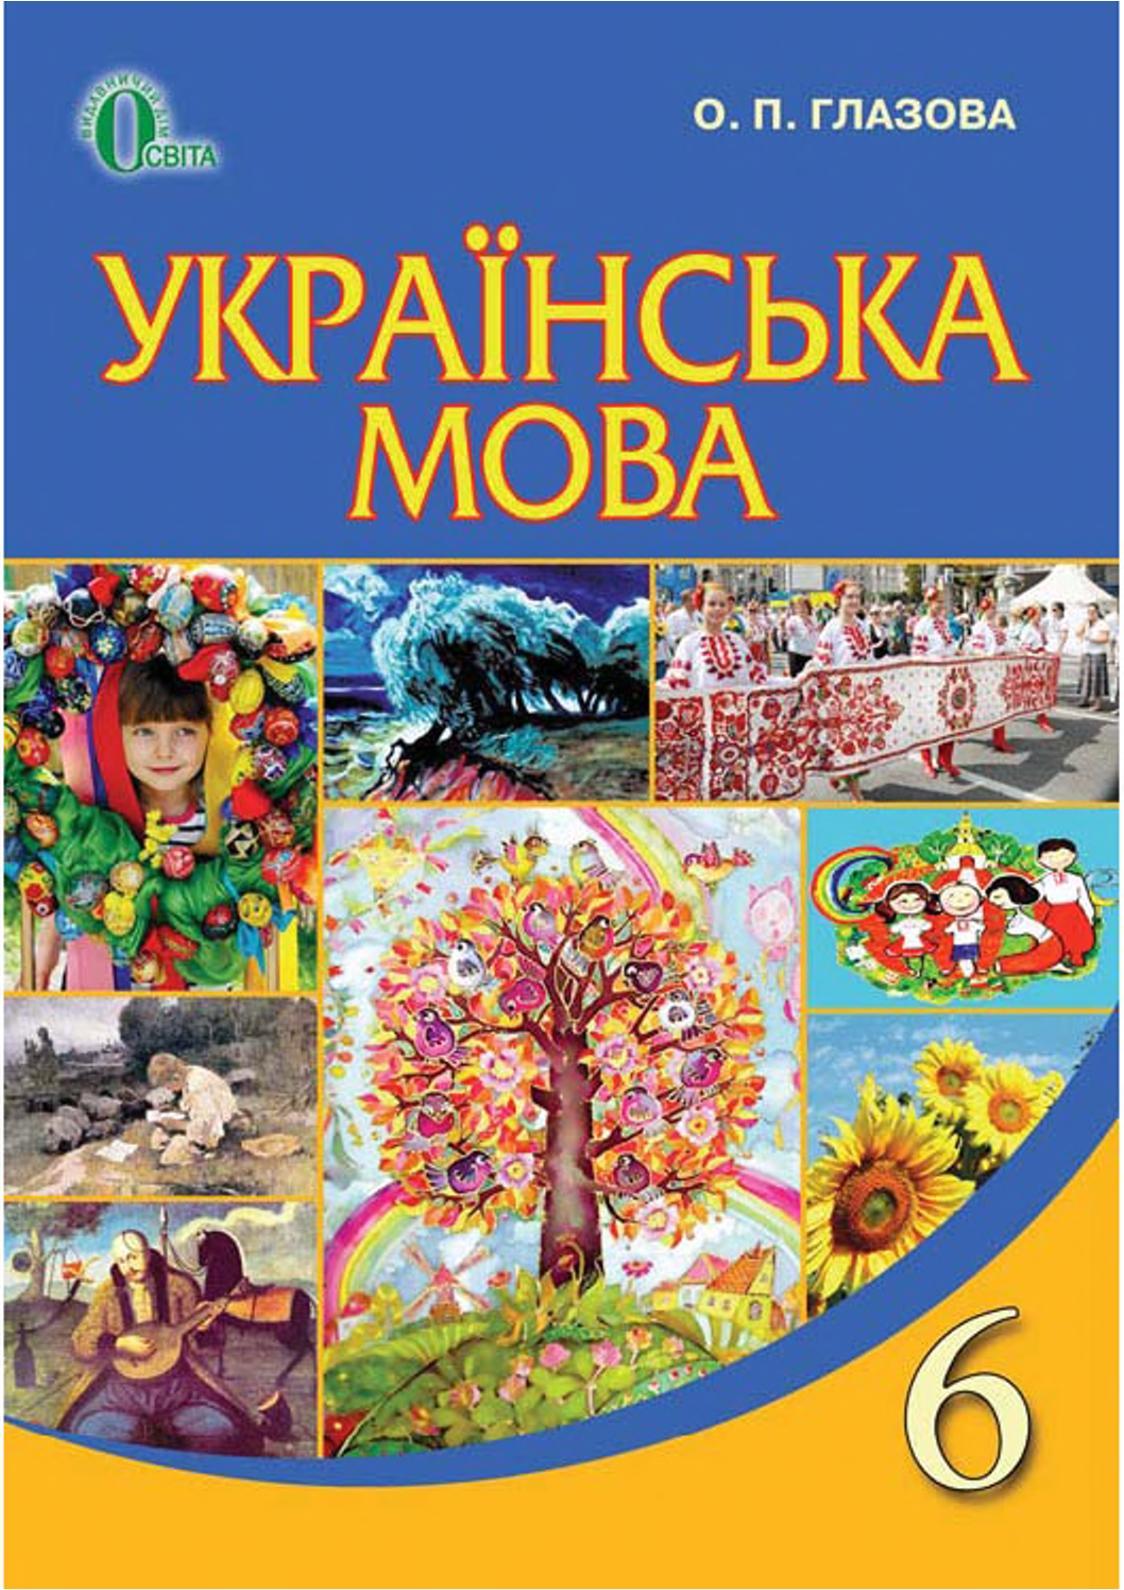 Calaméo - 6 клас. Українська мова (Глазова) - 2014 2a76b1fe52c6f